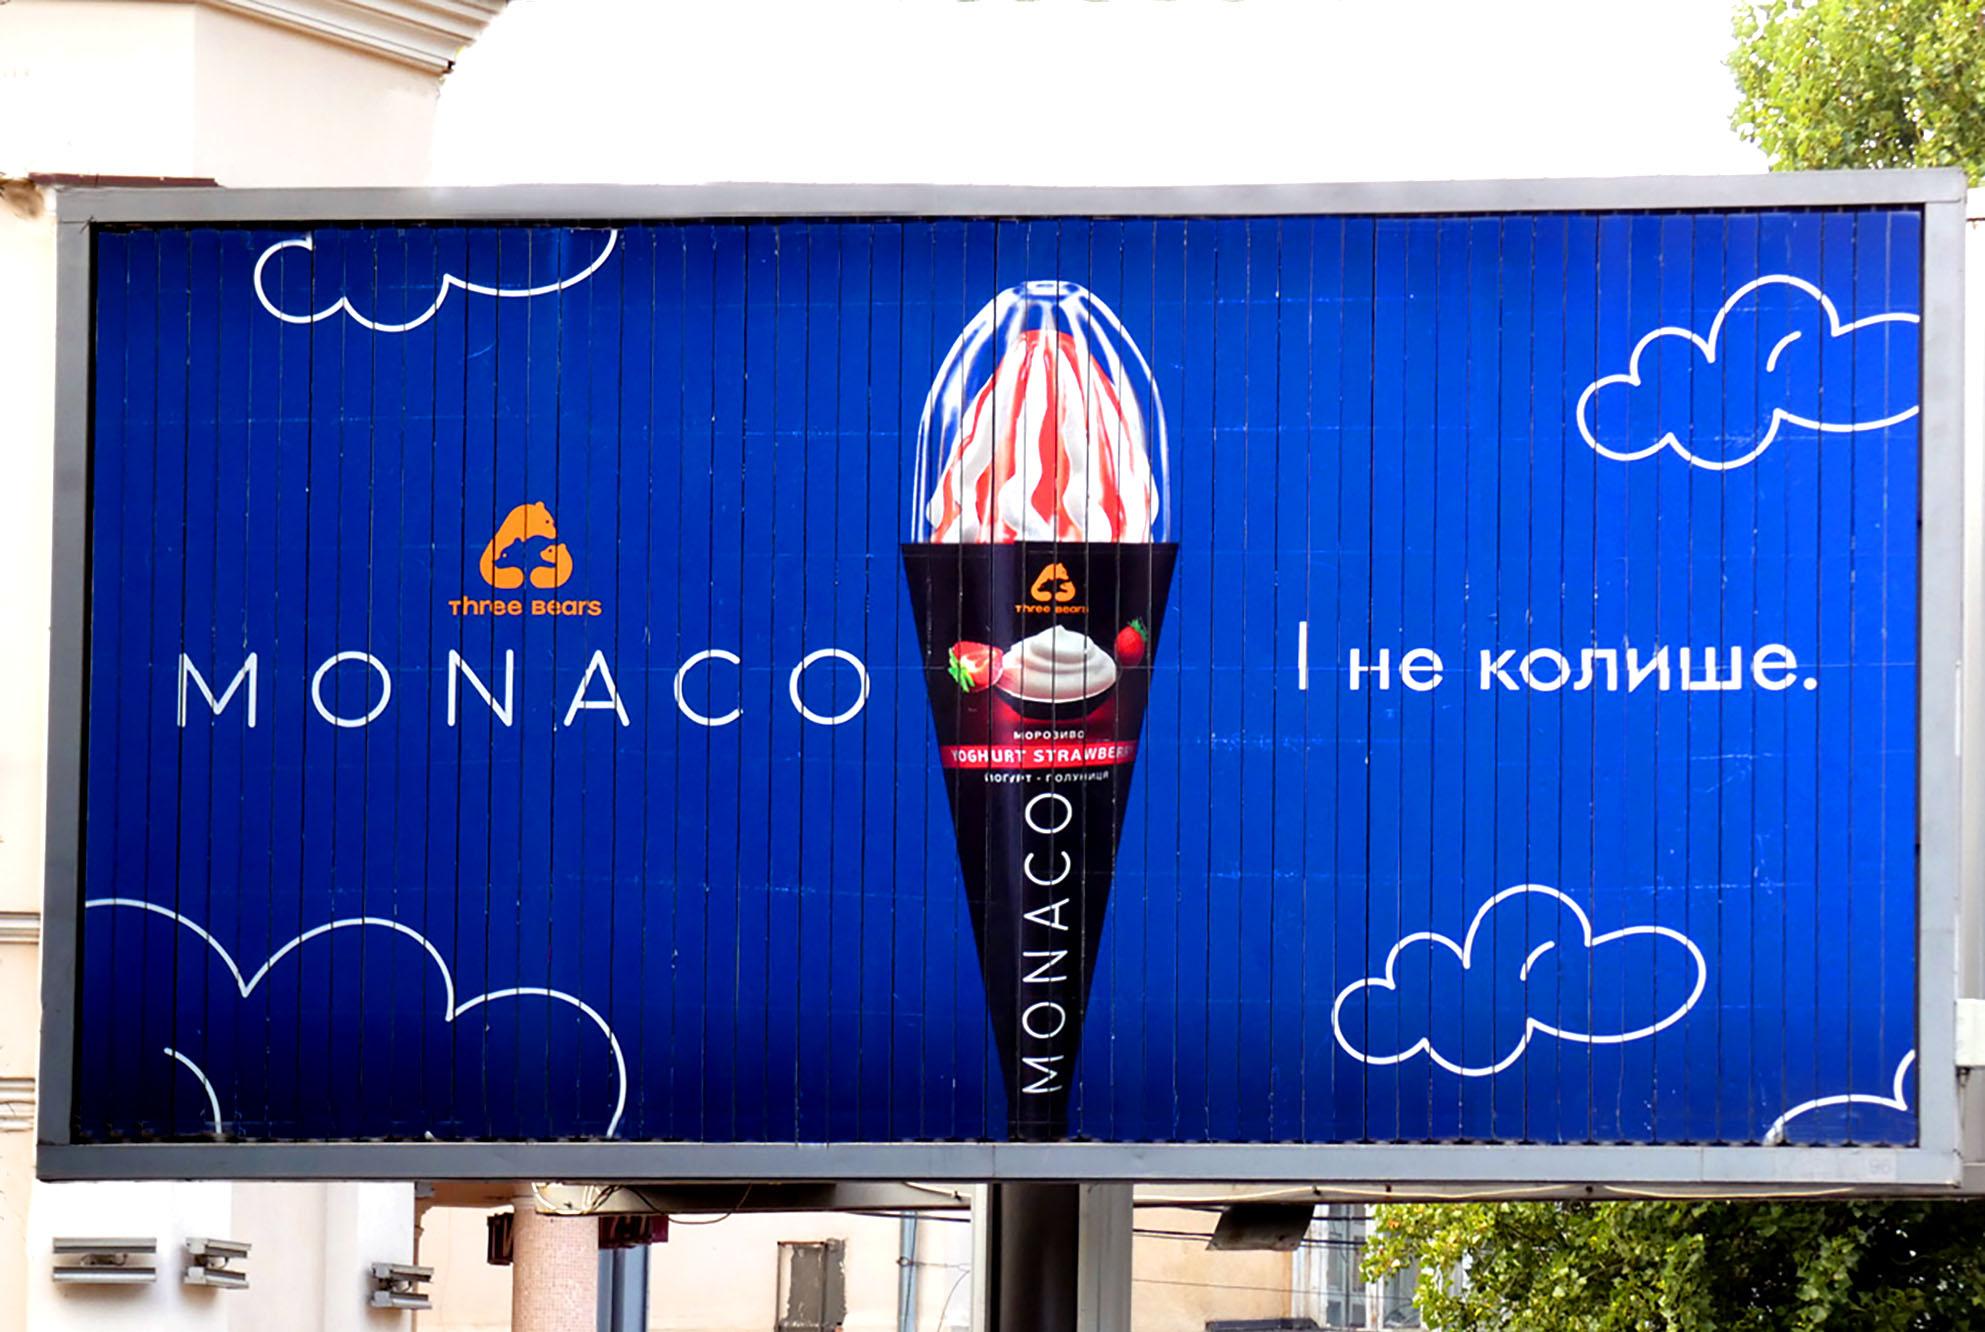 Реклама мороженого от компании Монако